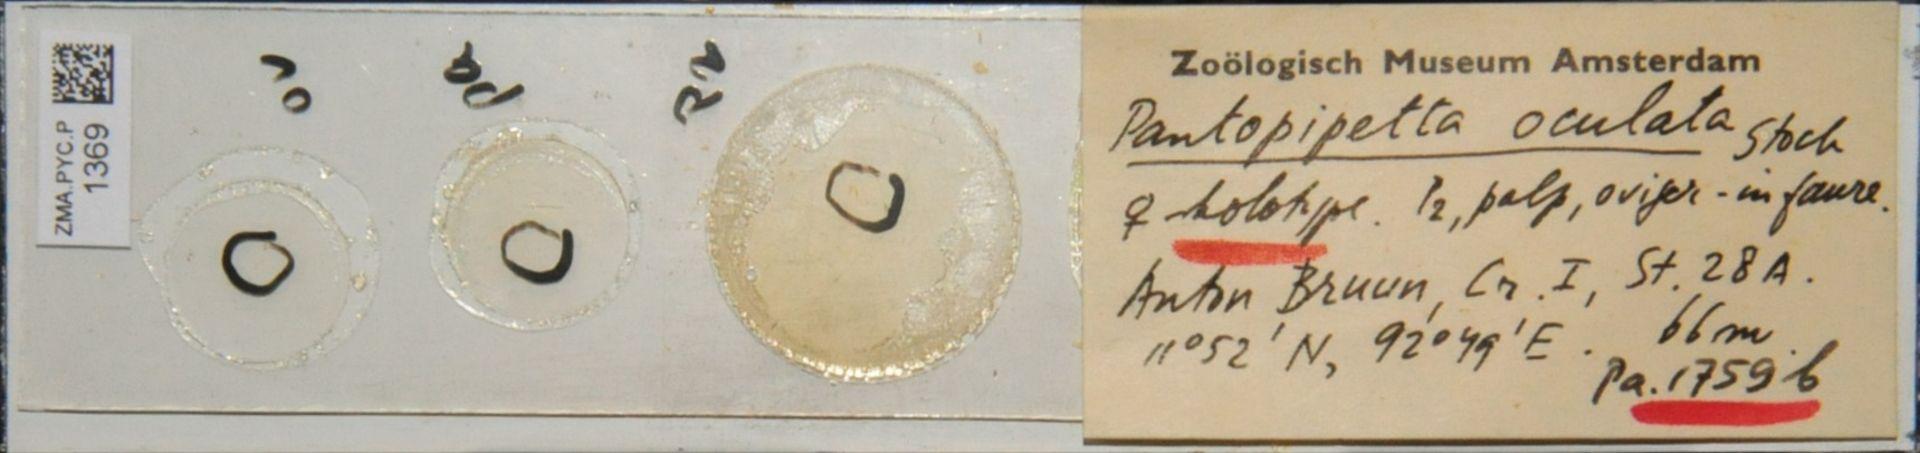 ZMA.PYC.P.1369 | Pantopipetta oculata Stock